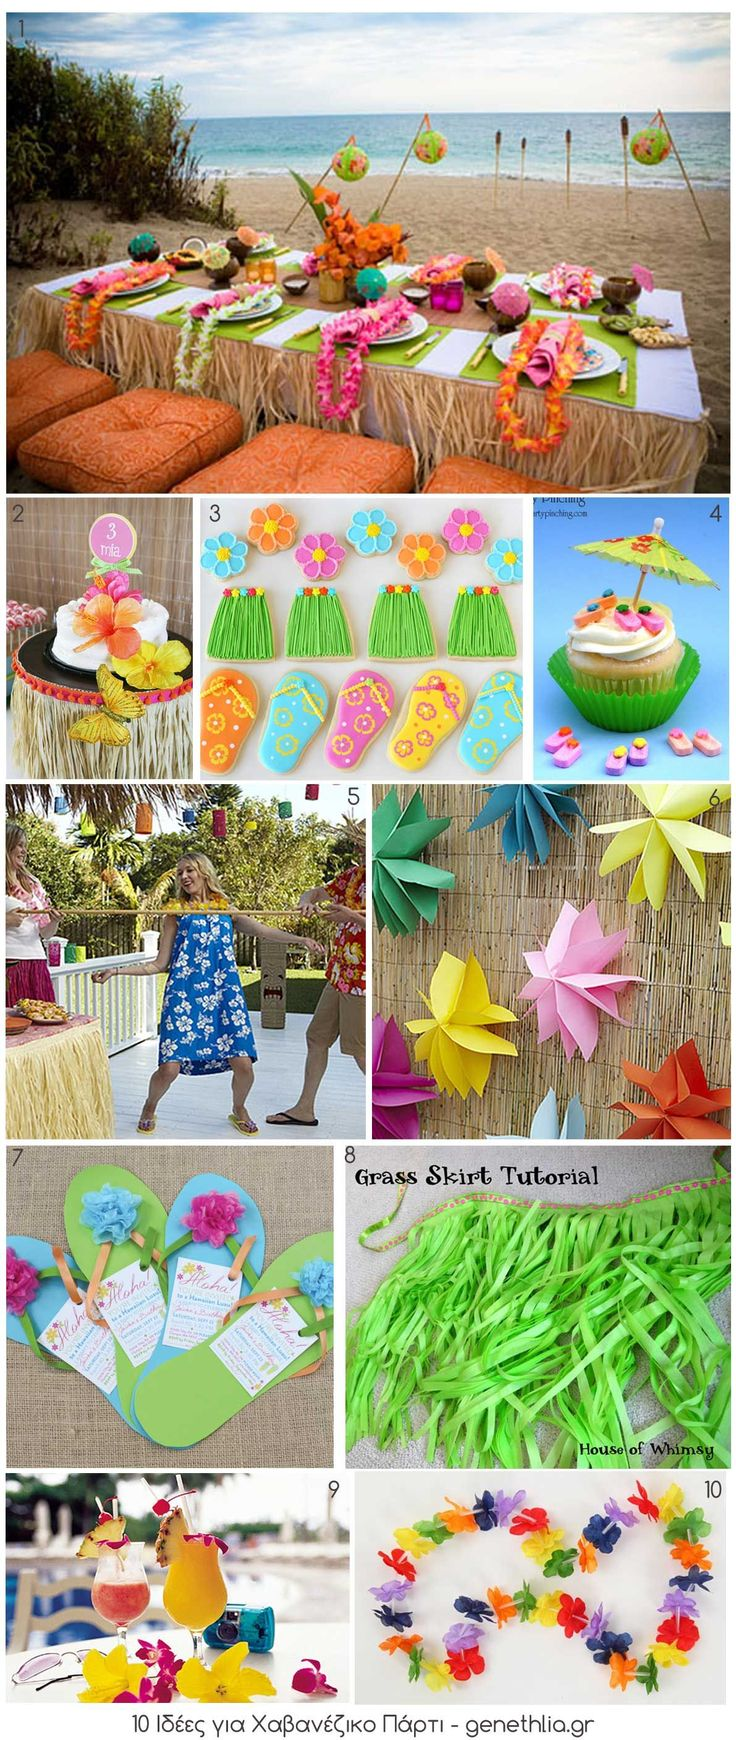 10 Luau party ideas #MGVSplendidSummer